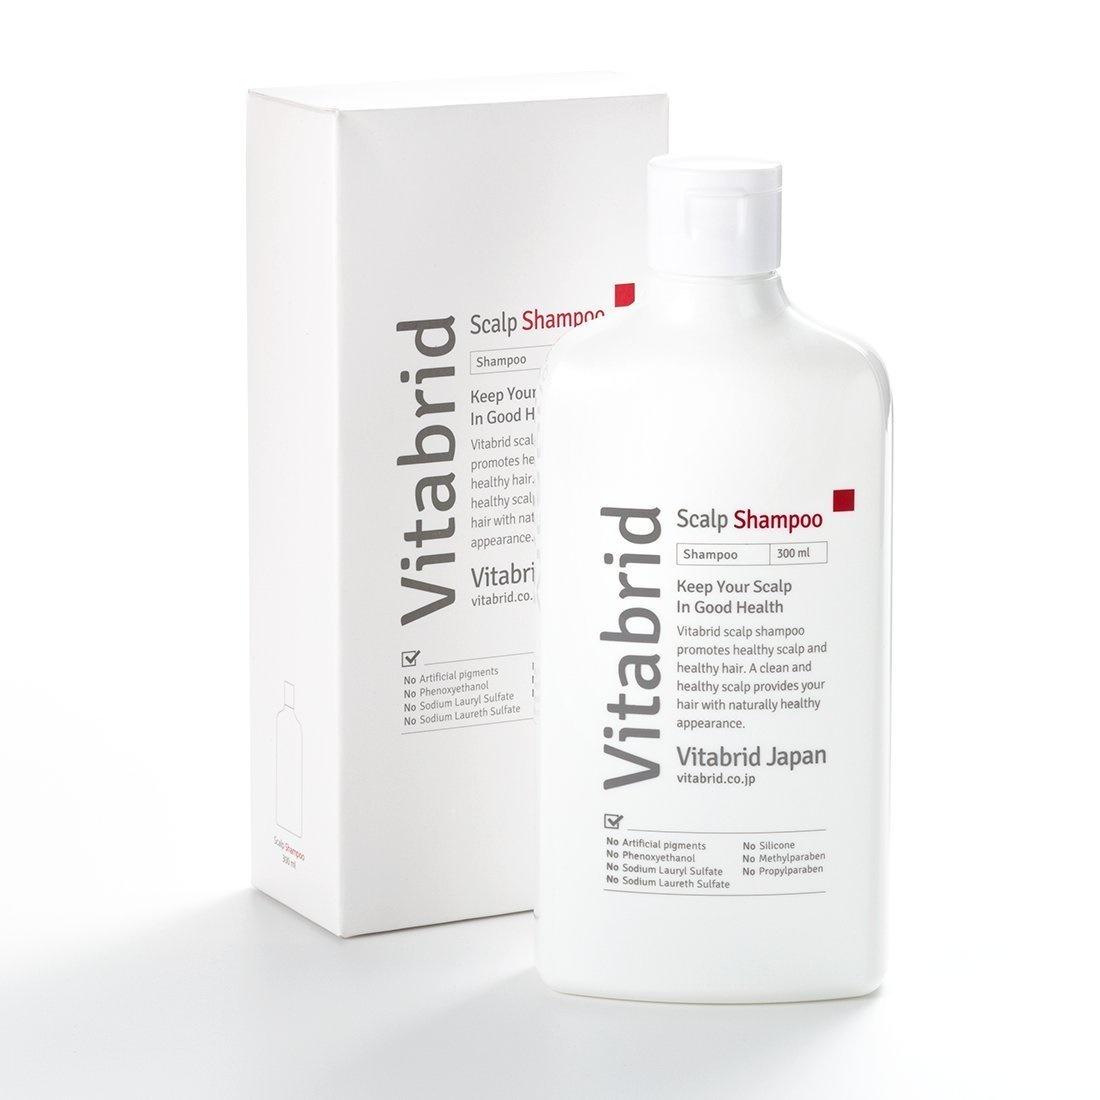 VITABRID C12 Scalp Shampoo 300ml